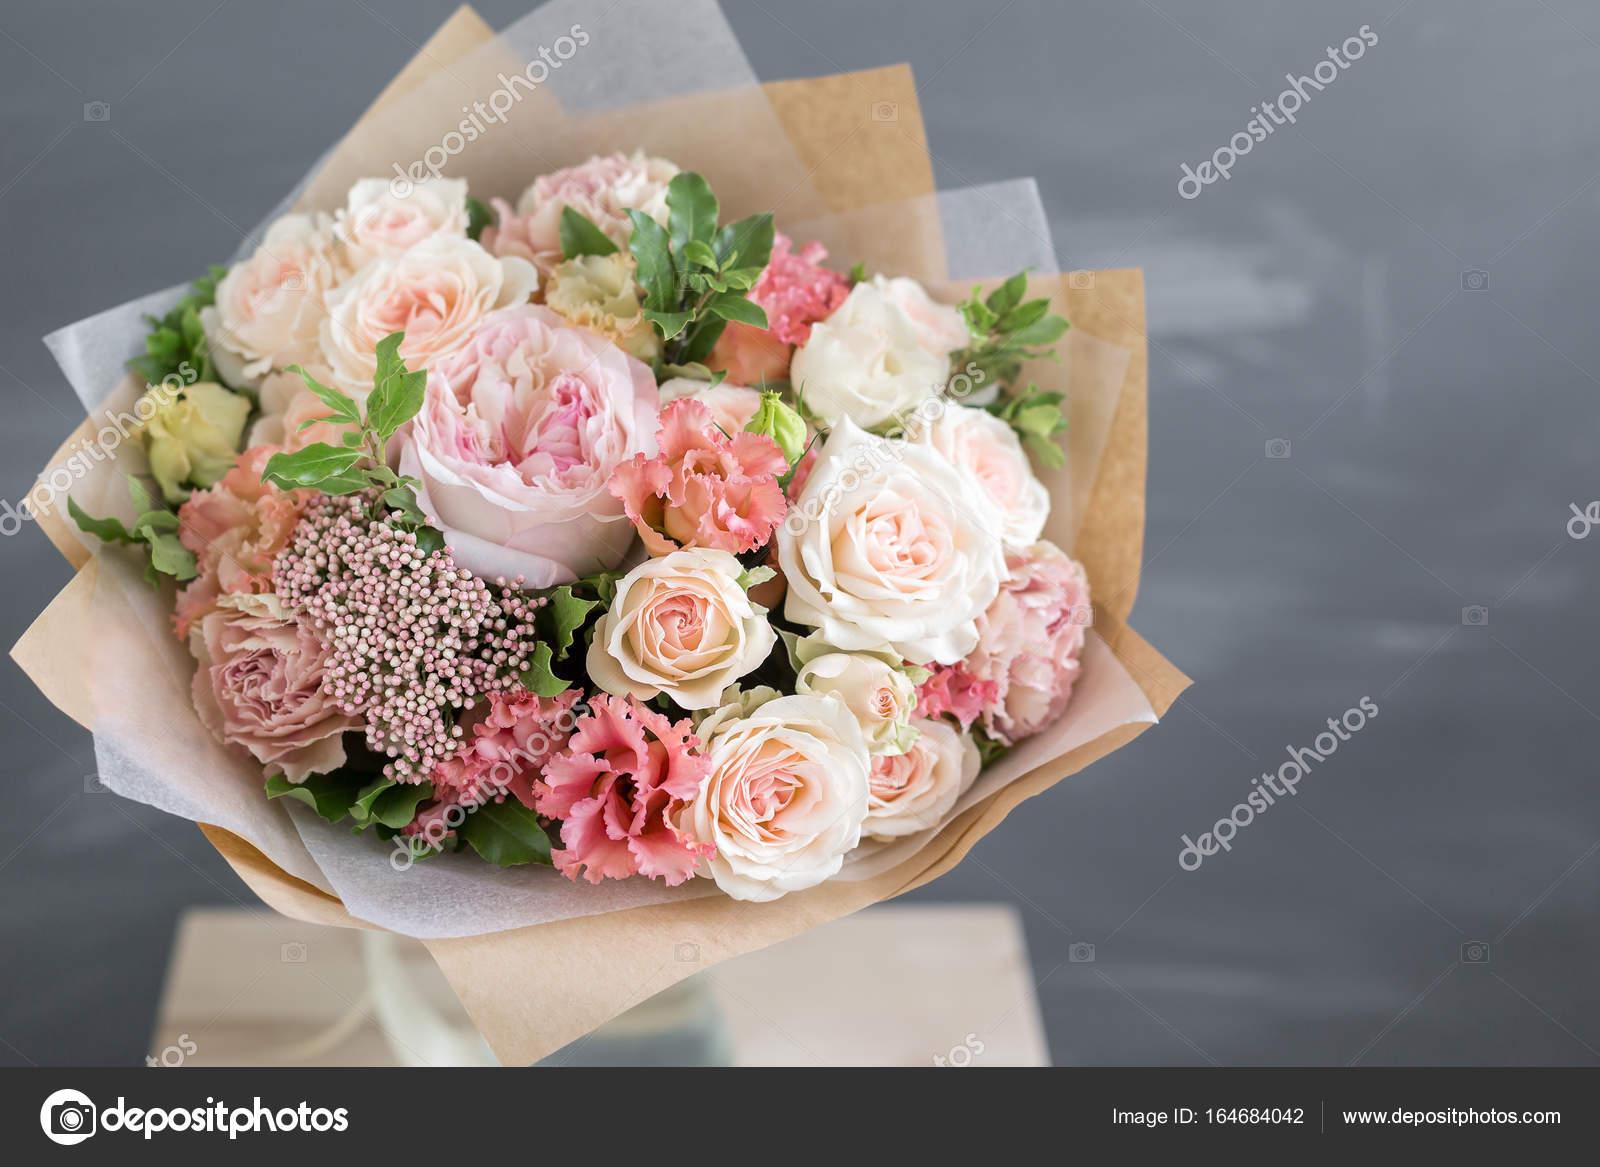 Bouquet in kraft paper a simple bouquet of flowers and greens bouquet in kraft paper a simple bouquet of flowers and greens stock photo izmirmasajfo